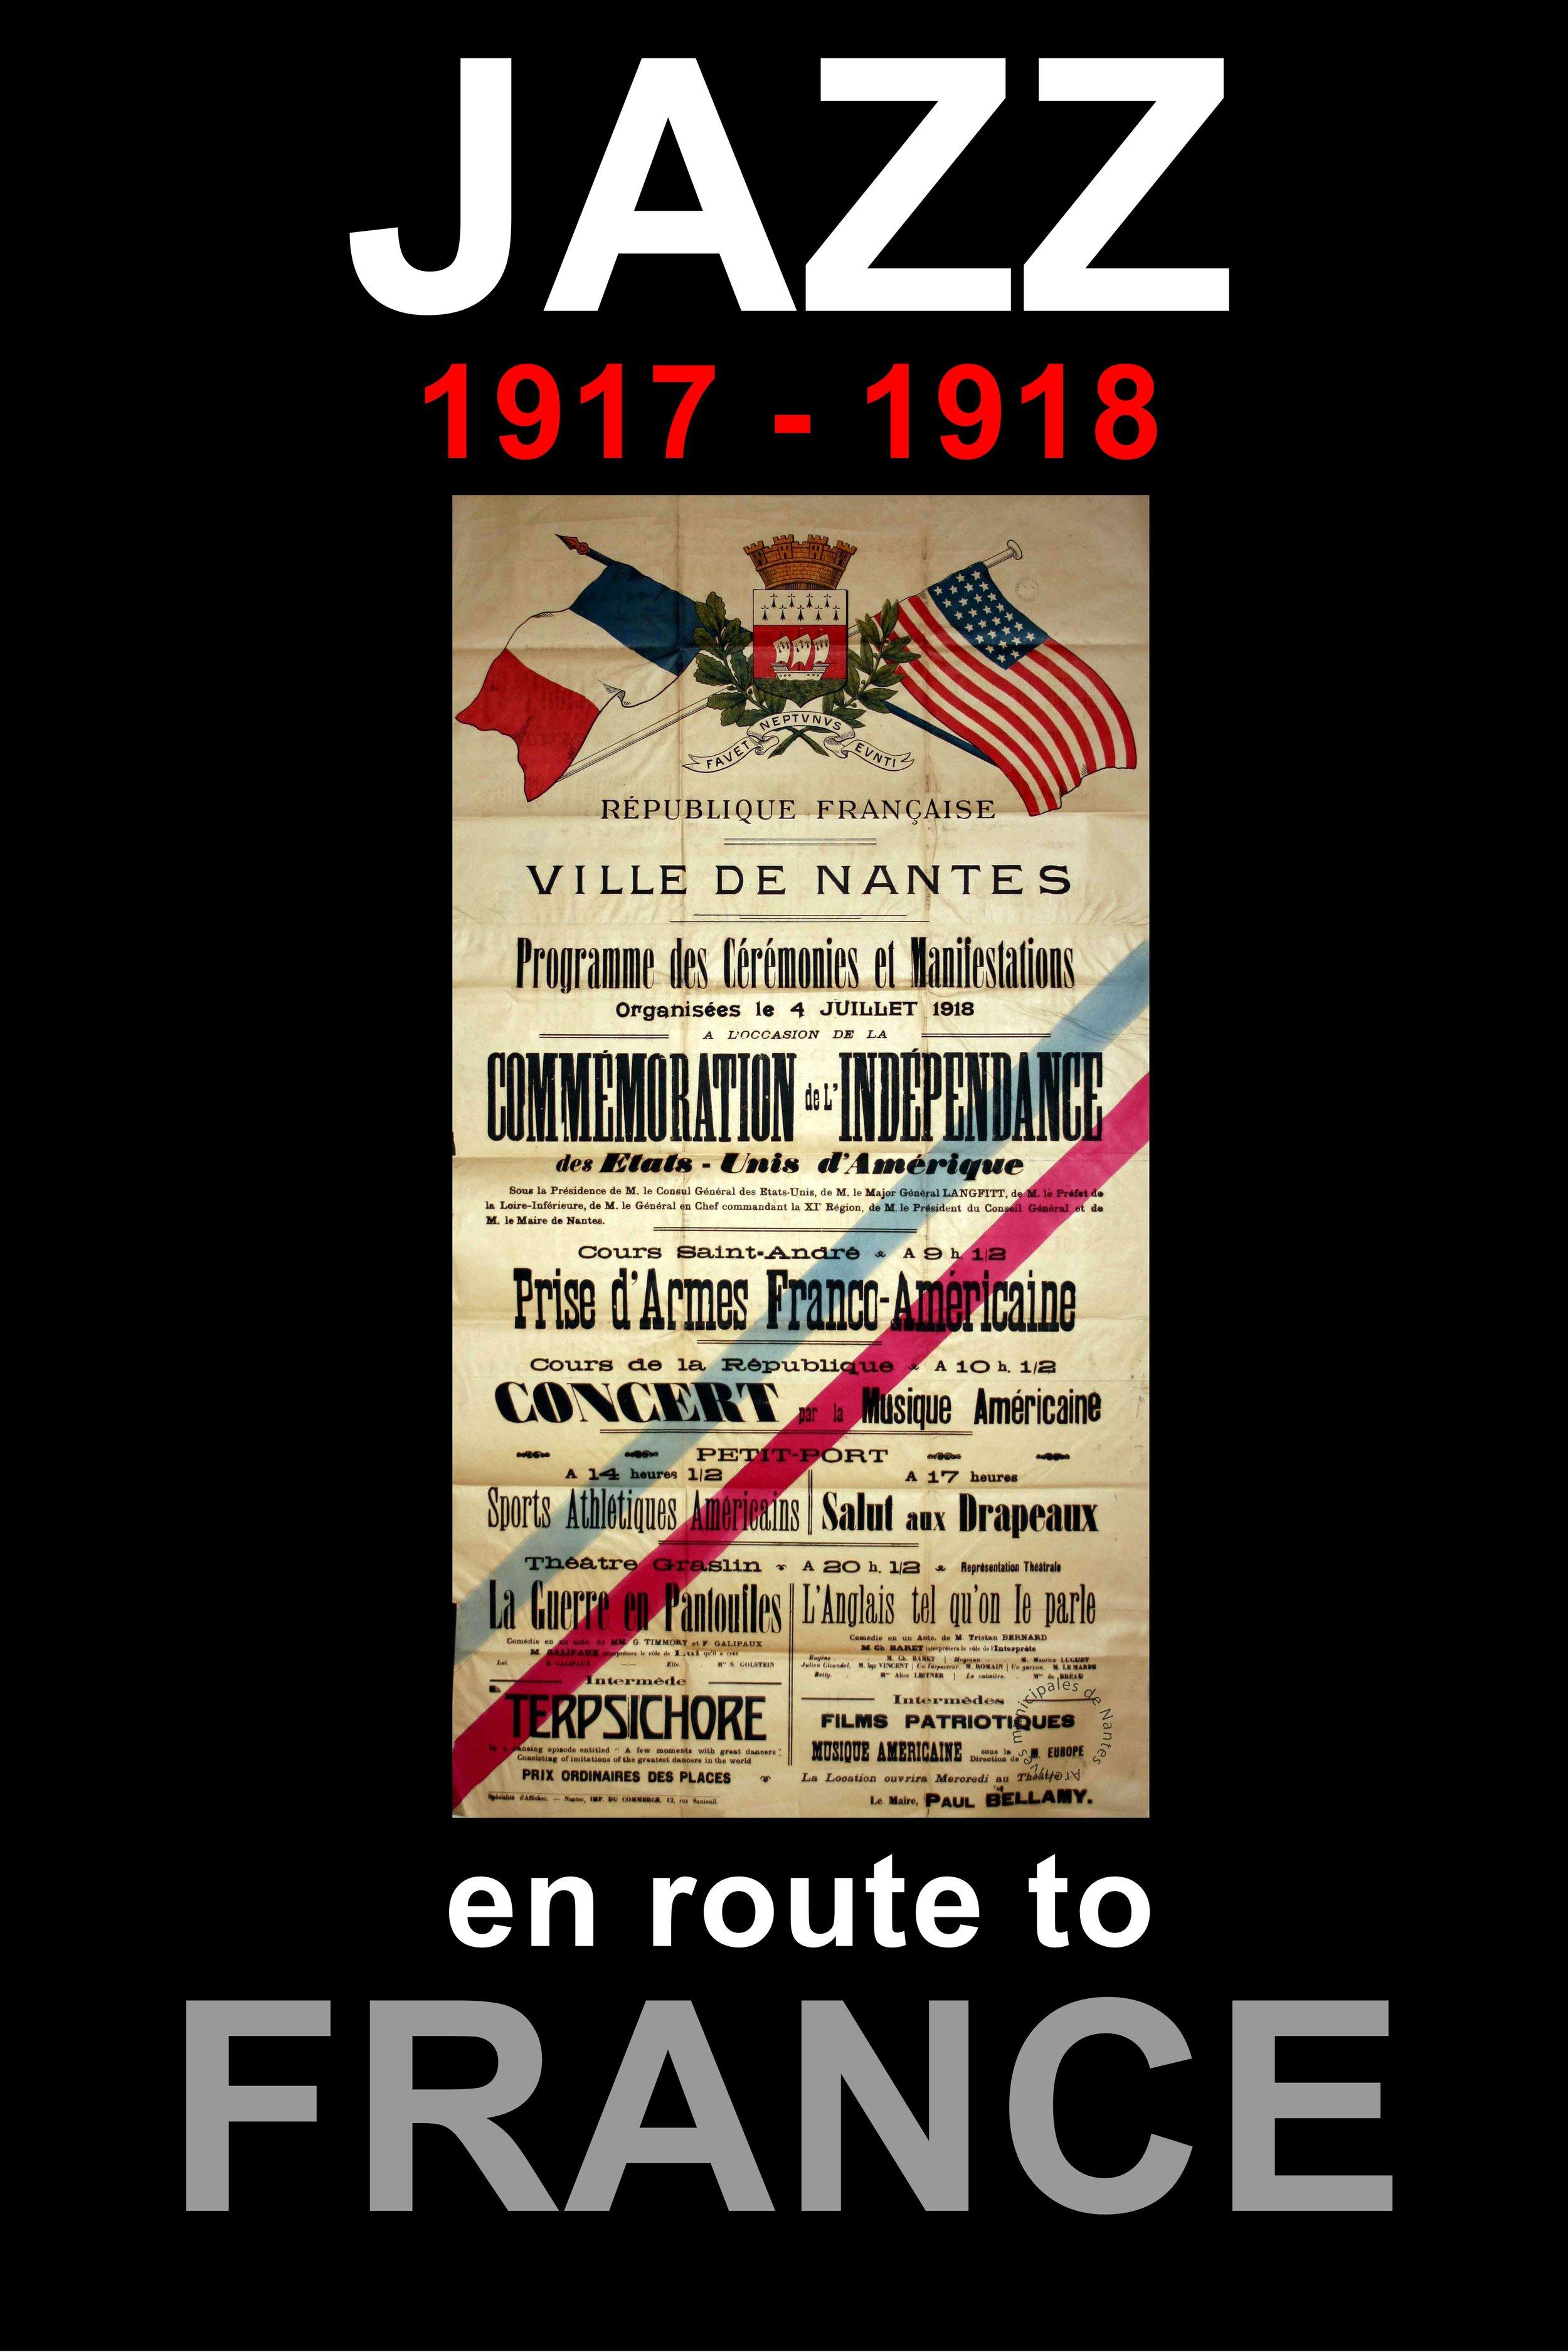 Jazz en route for France-affiche vers 0.jpg